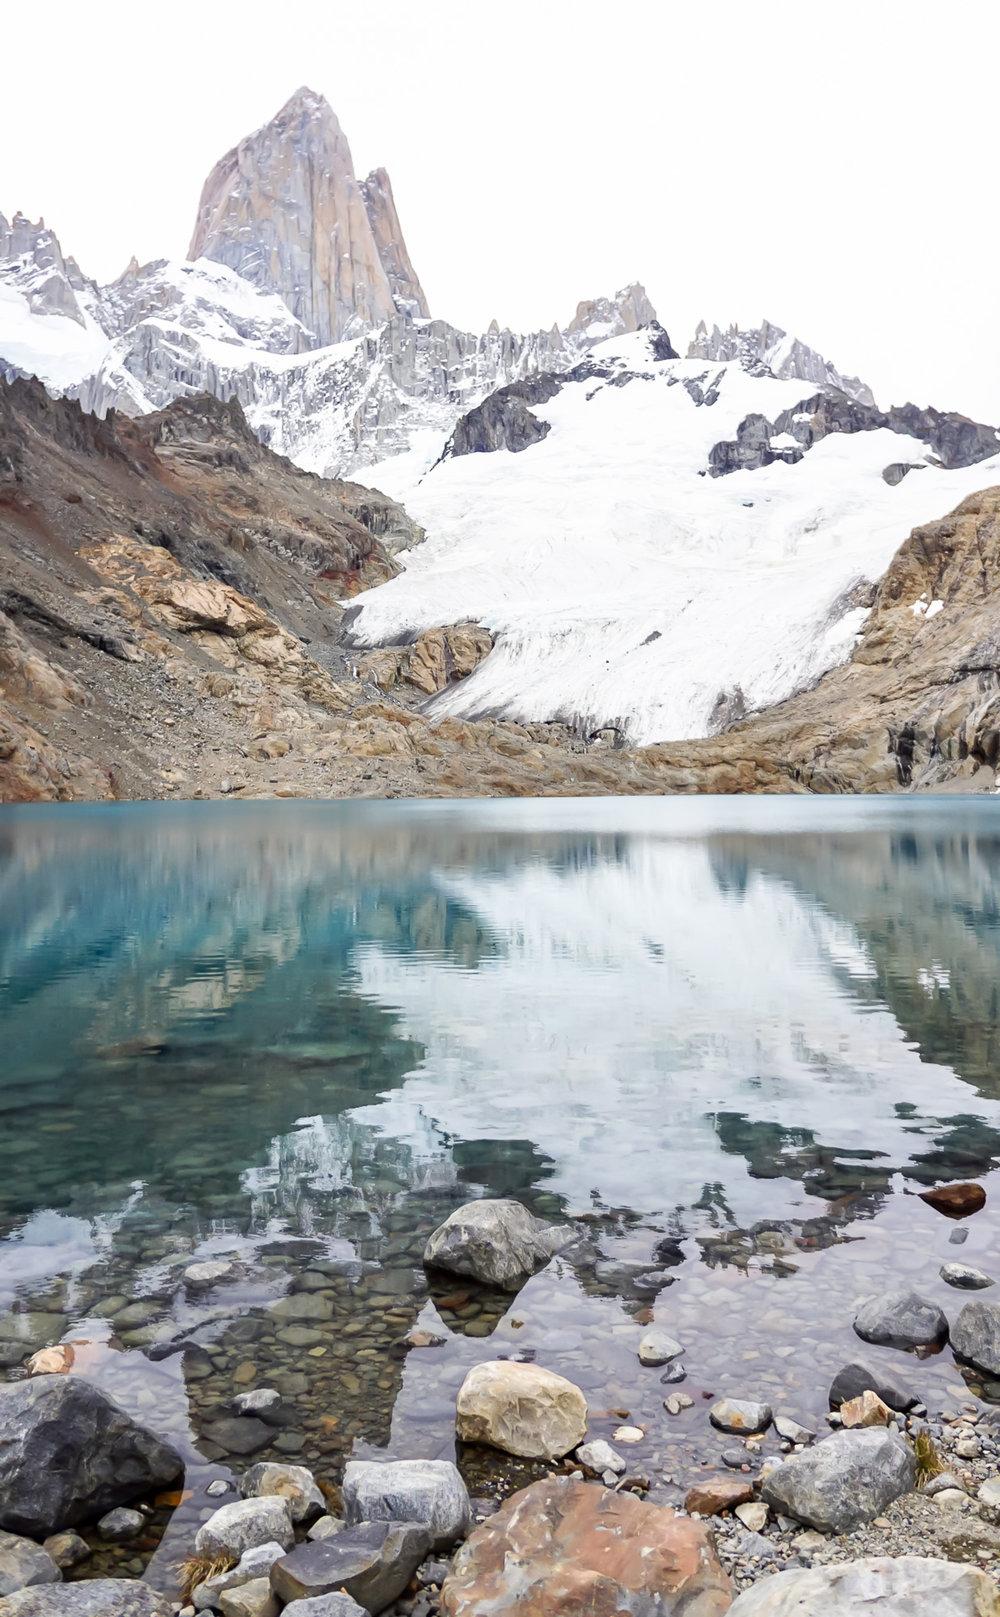 El Chalten, Argentina